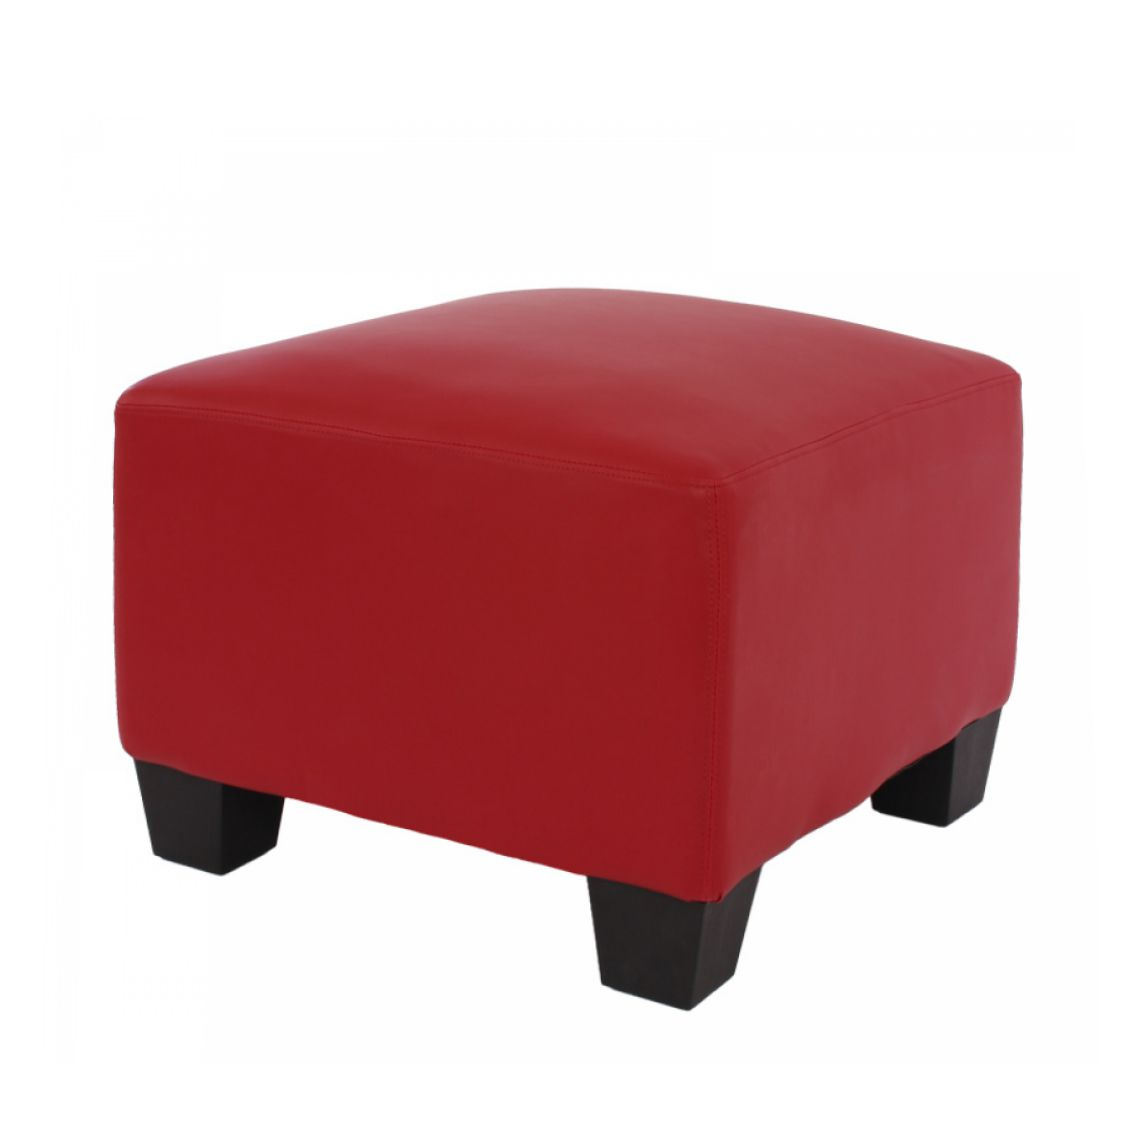 Modular Sofa-System Lyon – Ottomane, rot, Mendler kaufen